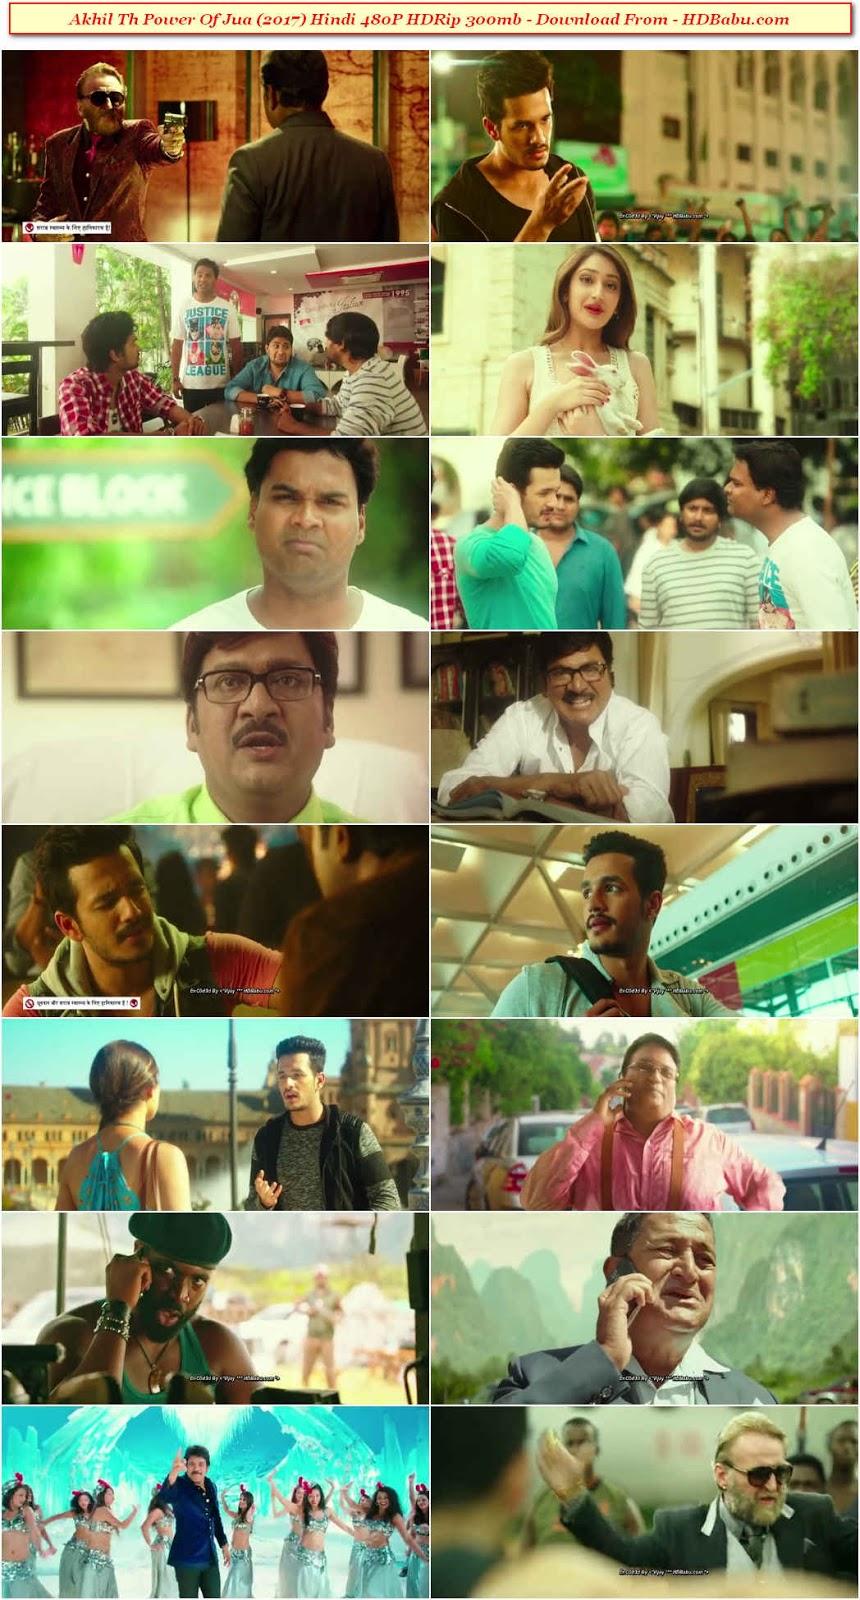 Akhil The Power of Jua Hindi Dubbed Movie Downloa